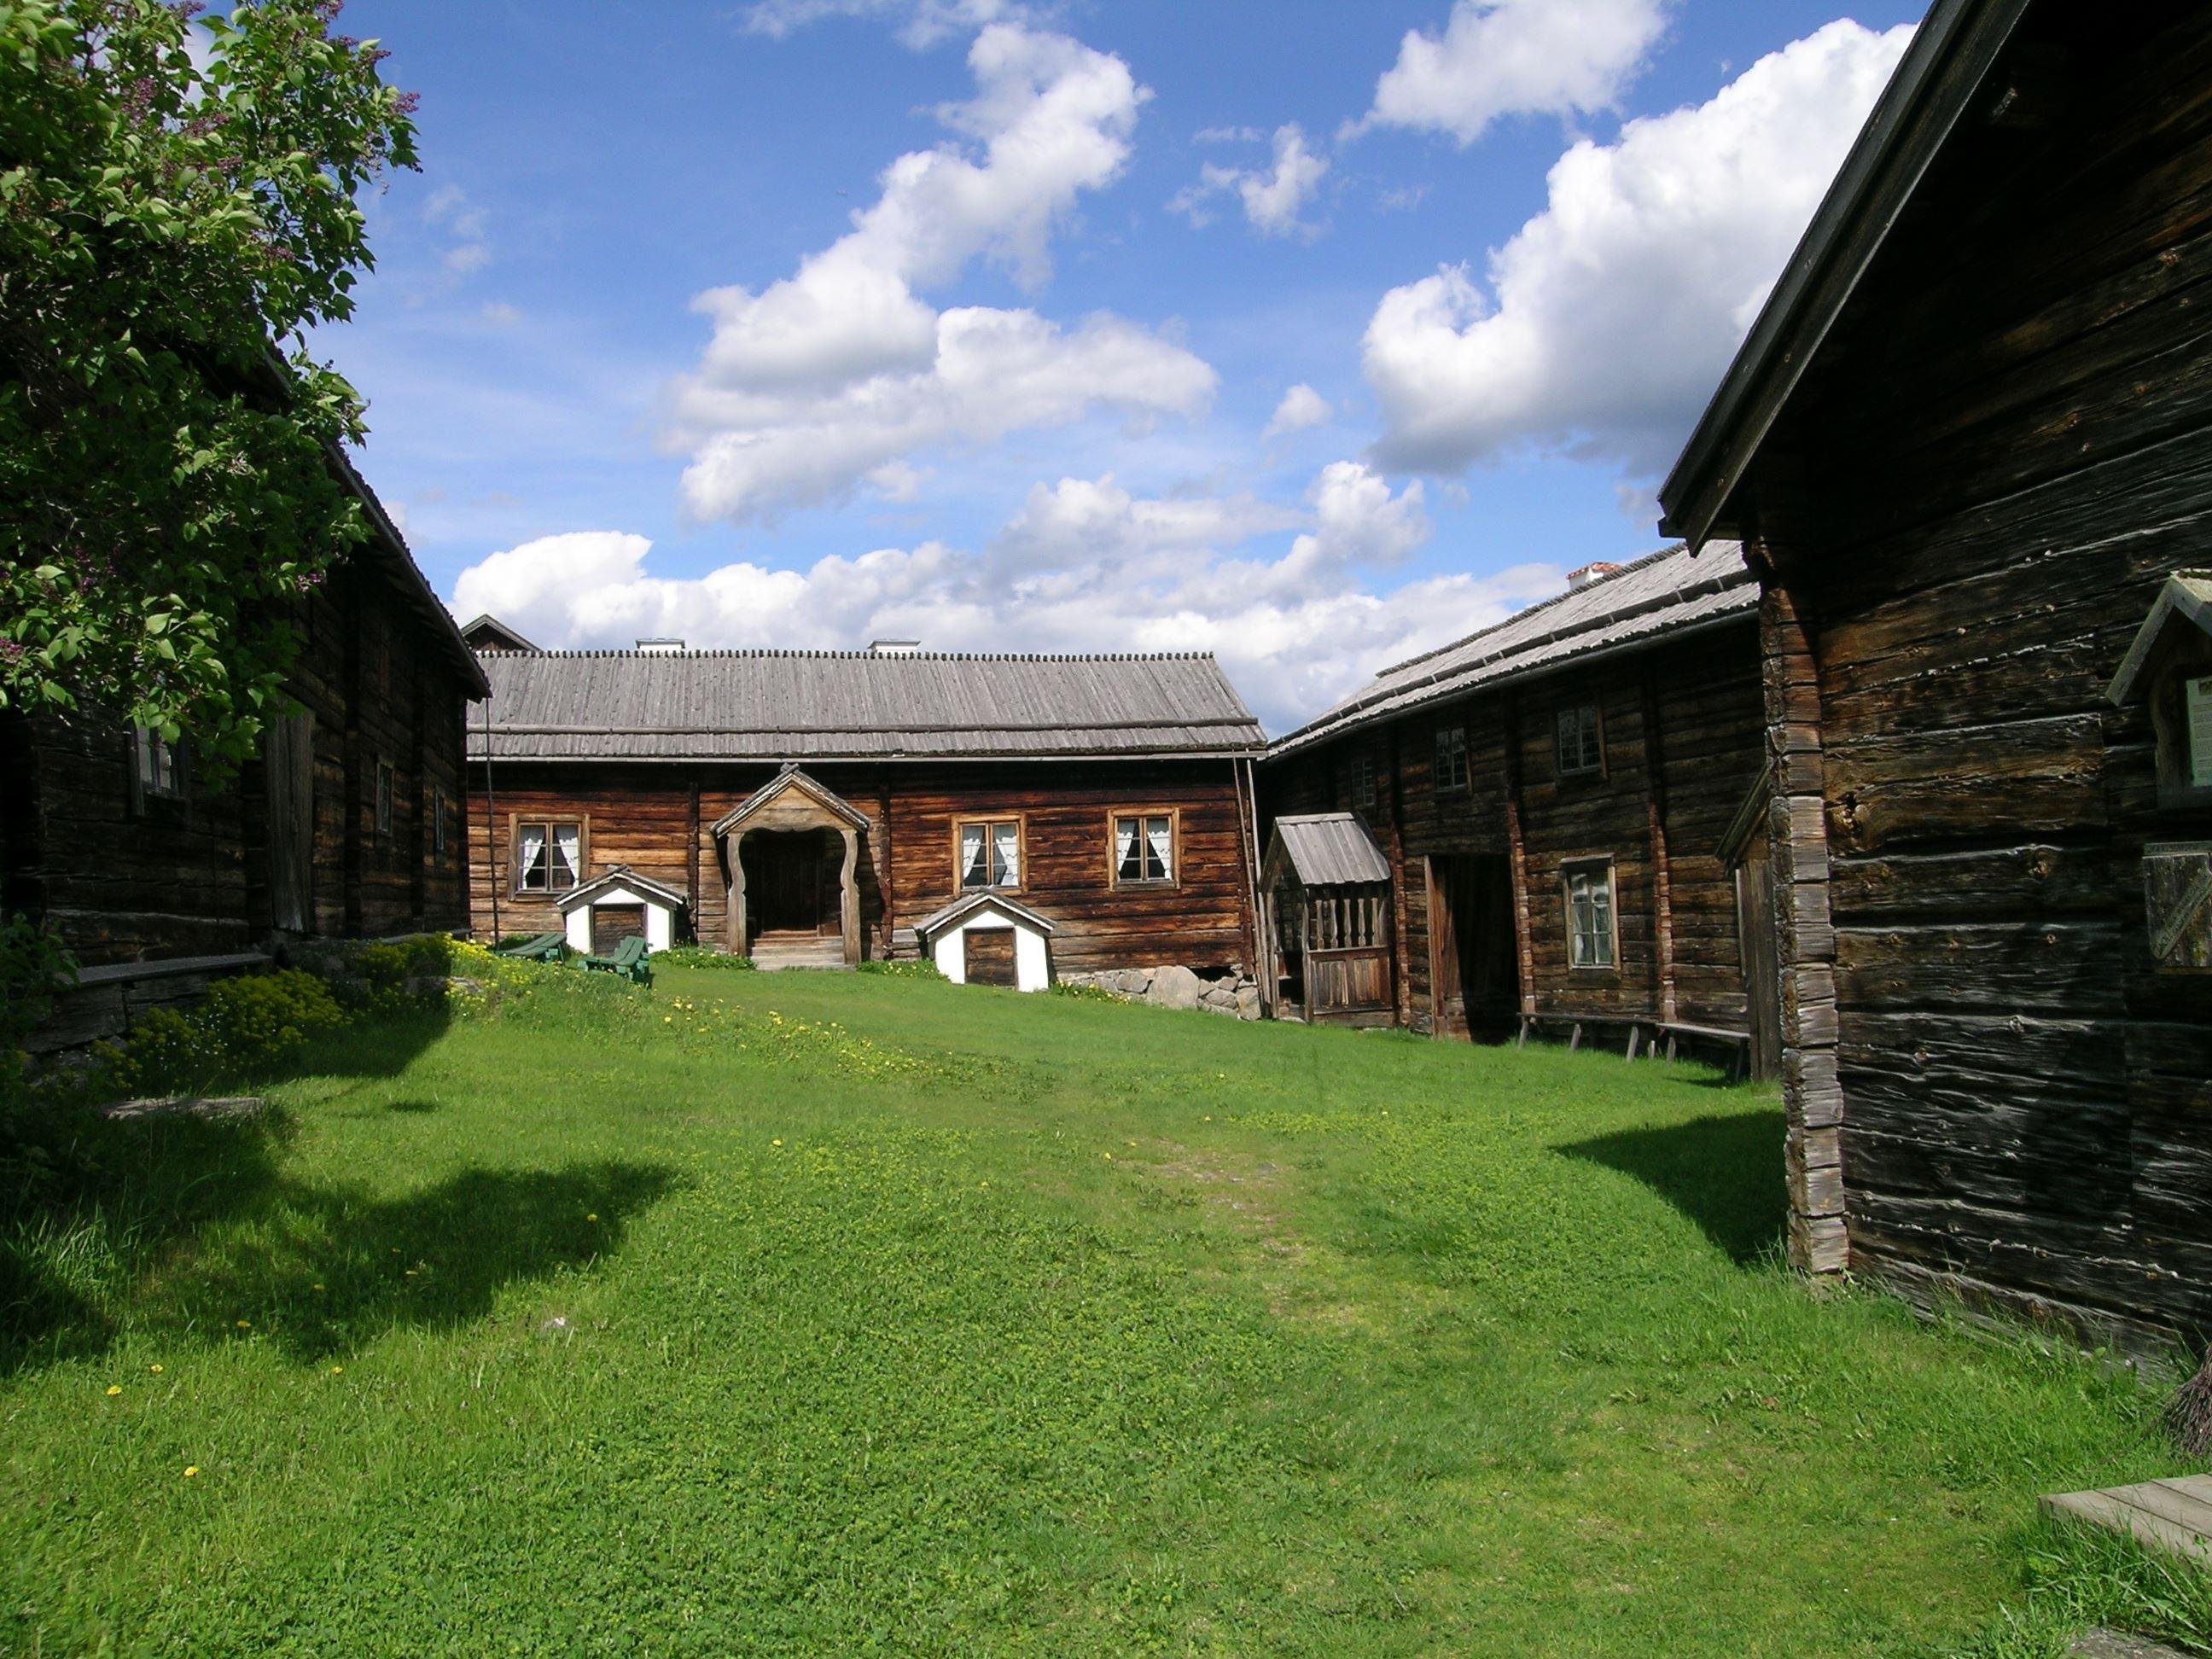 Karls, Bondarv, Järvsö